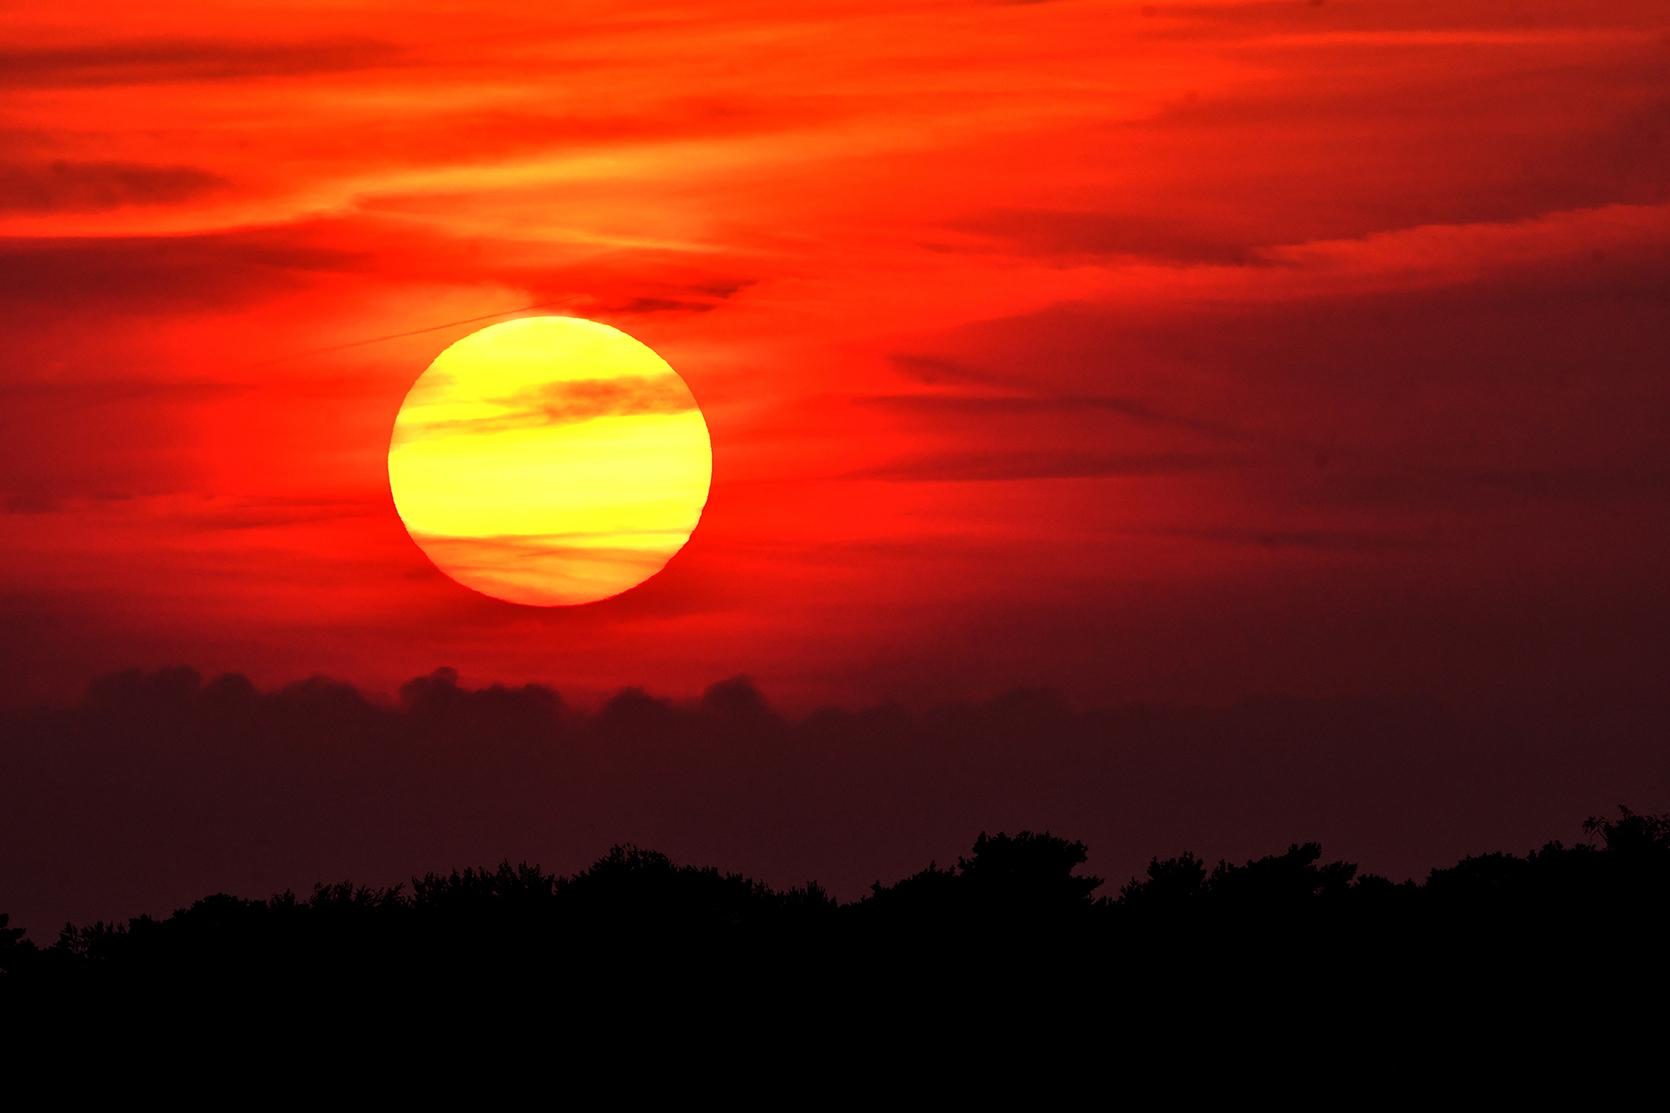 Een schitterende zonsondergang boven de bosrand en een vuurrode avondhemel als achtergronddecor – Foto: ©Louis Fraanje